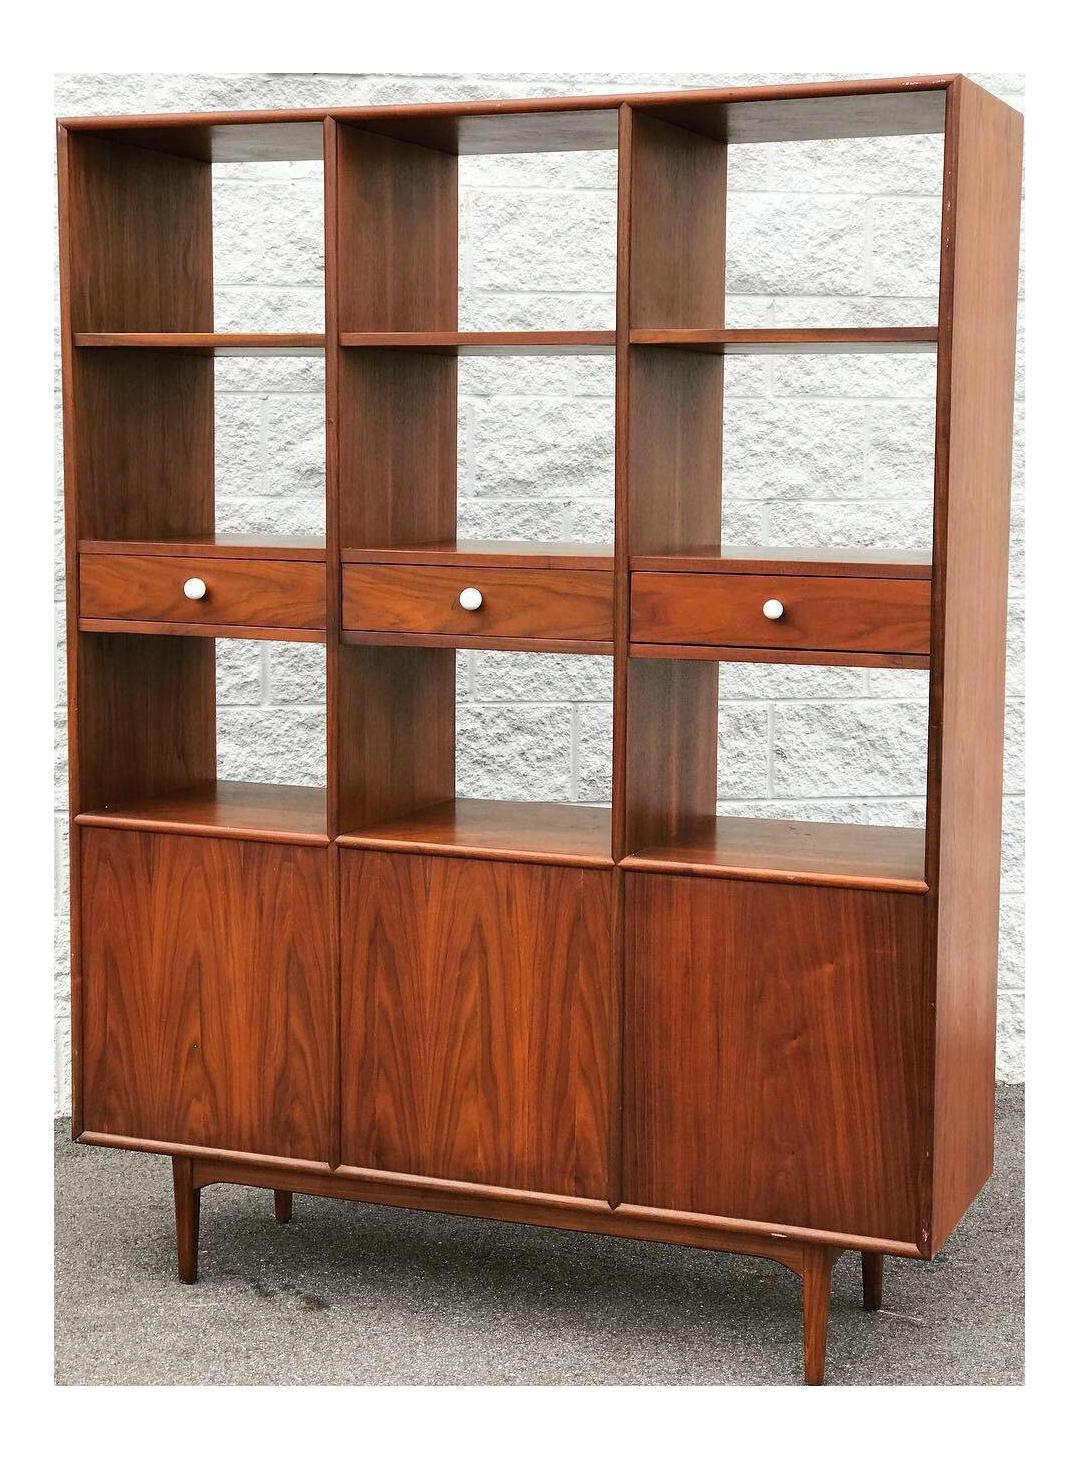 Vintage & Used Mid-Century Modern Wall Cabinets | Chairish